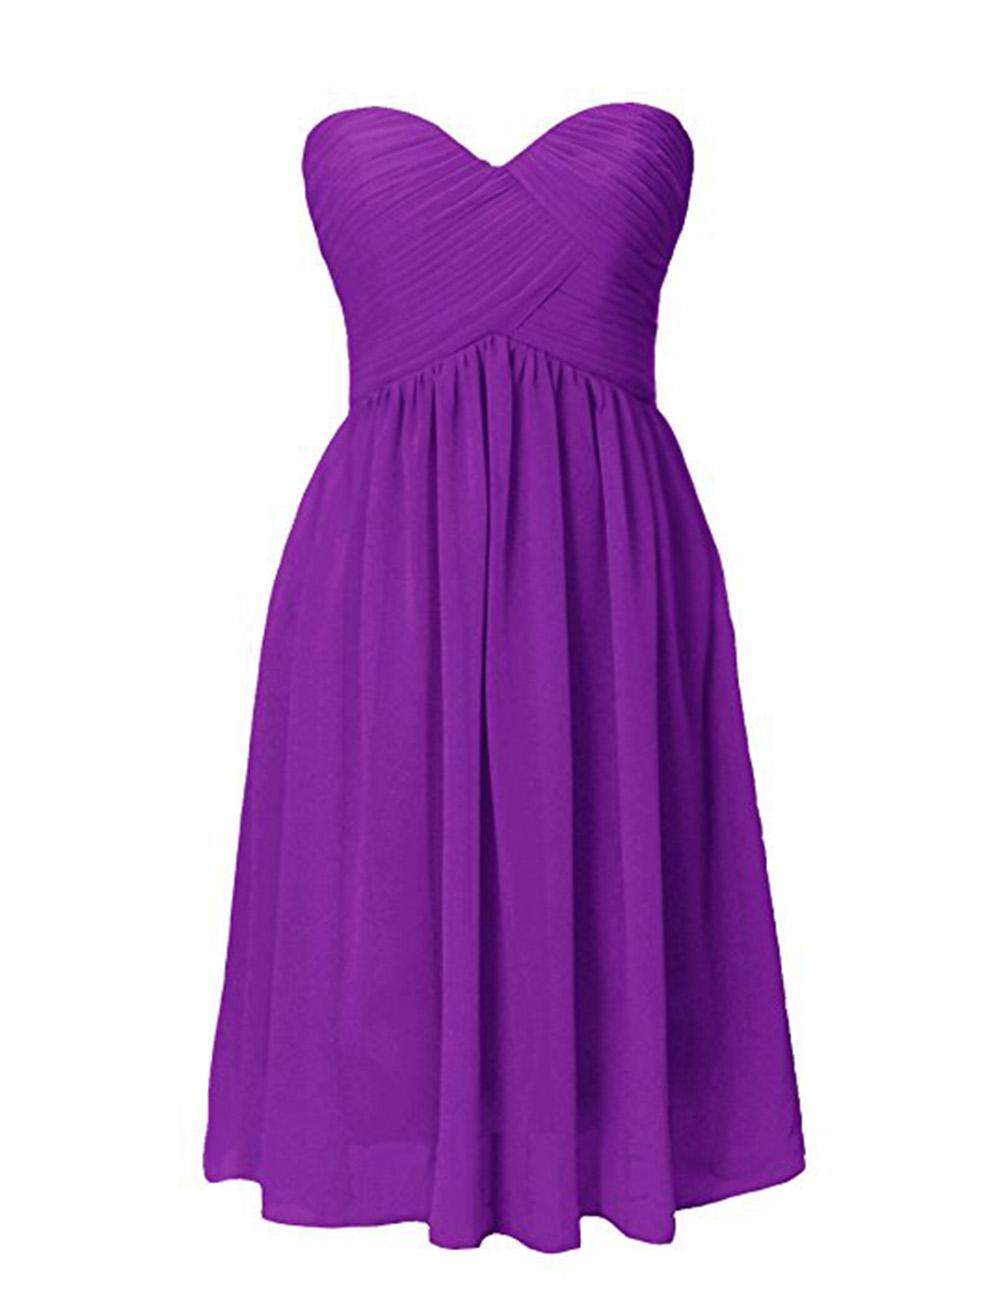 Women's Sweetheart Pleated Strapless Chiffon Bridesmaid Knee-Length Evening Dress